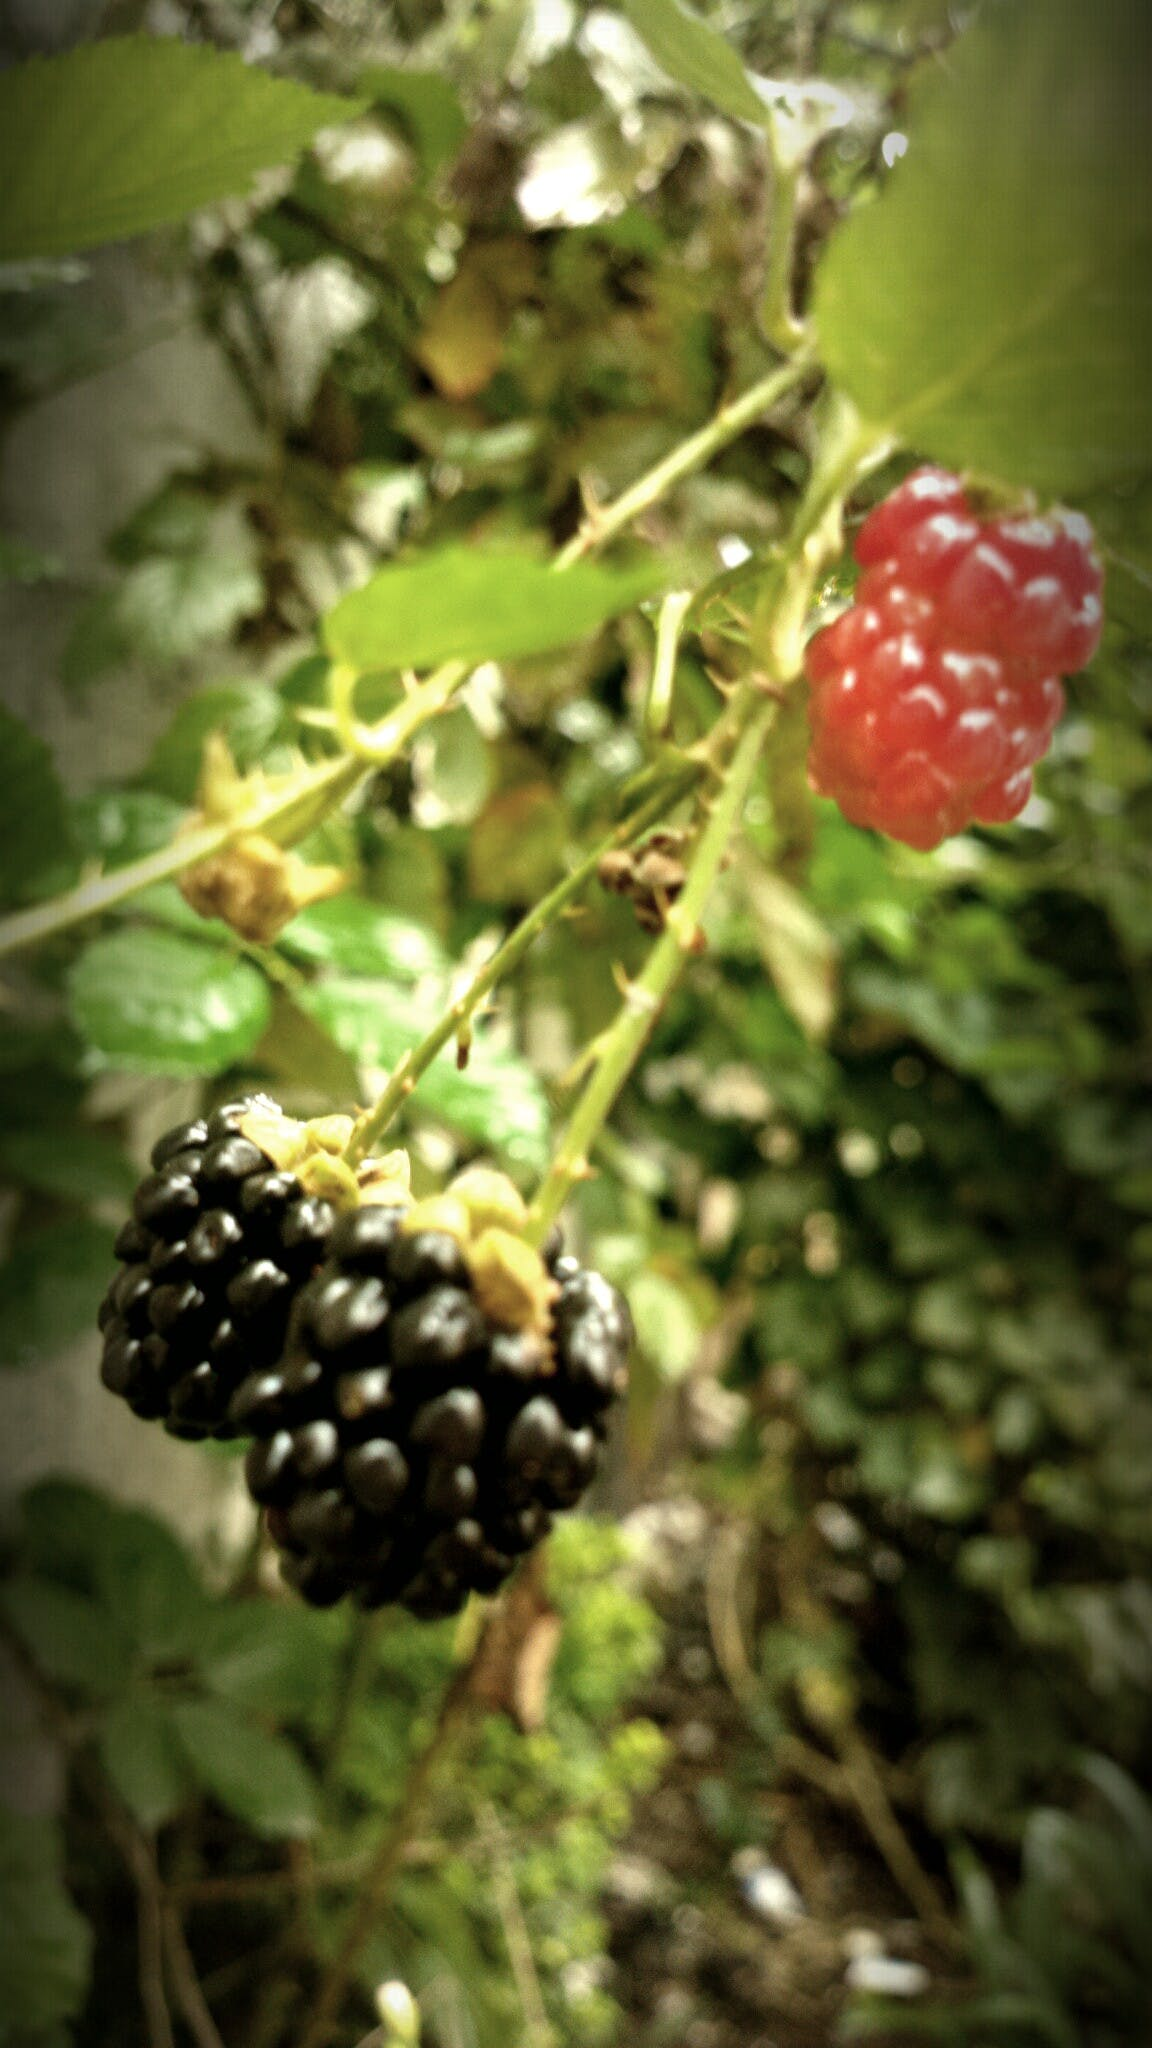 Free stock photo of citrus fruit, contrast, garden, green